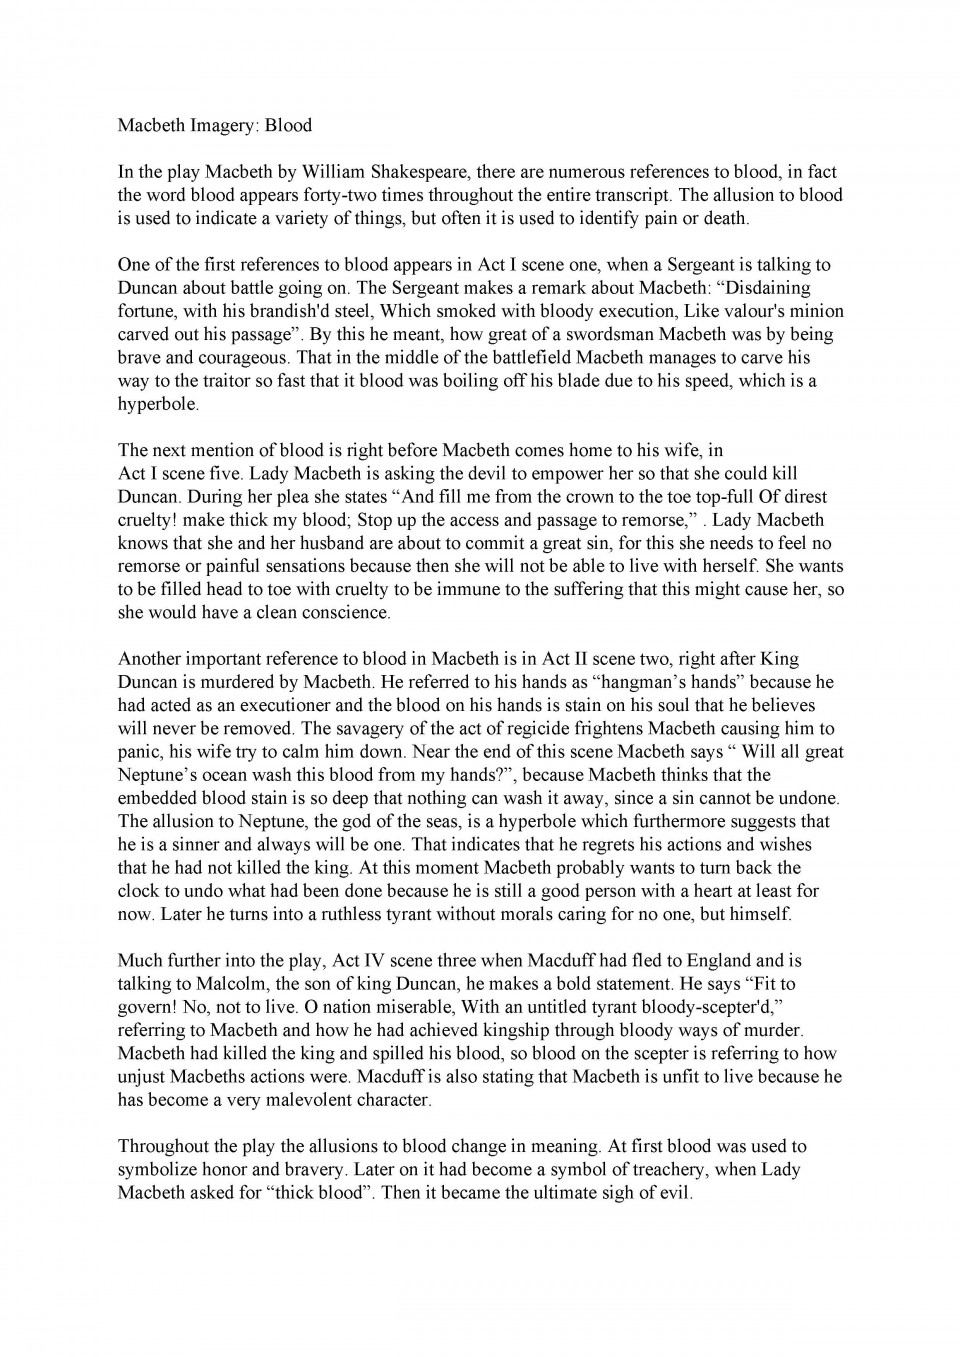 005 Essay Example Macbeth Sample Racism Dreaded Today 960